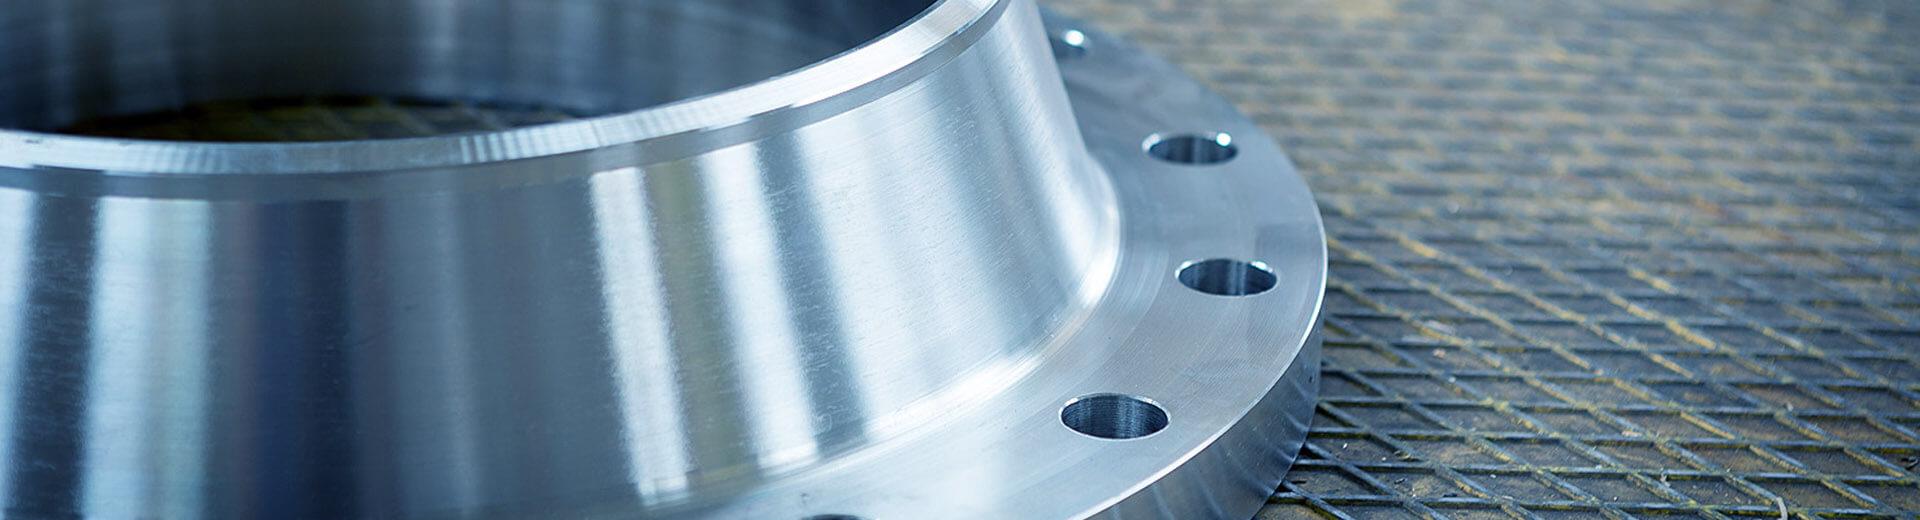 Steeltrade-flange-in-acciaio3